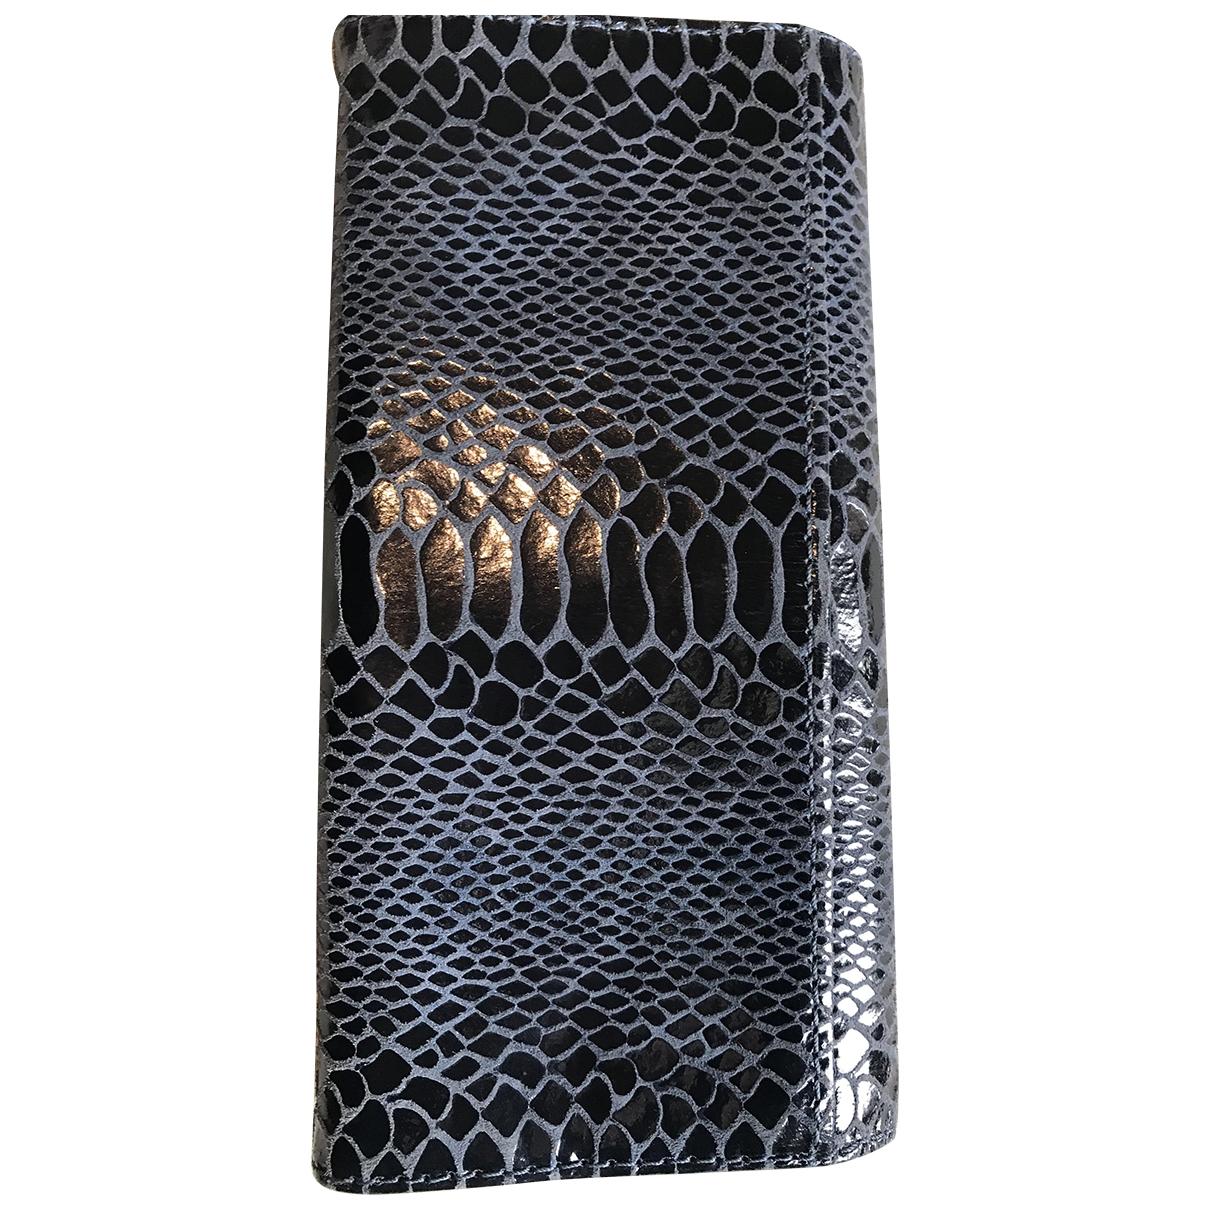 Michael Kors \N Blue Leather Purses, wallet & cases for Women \N